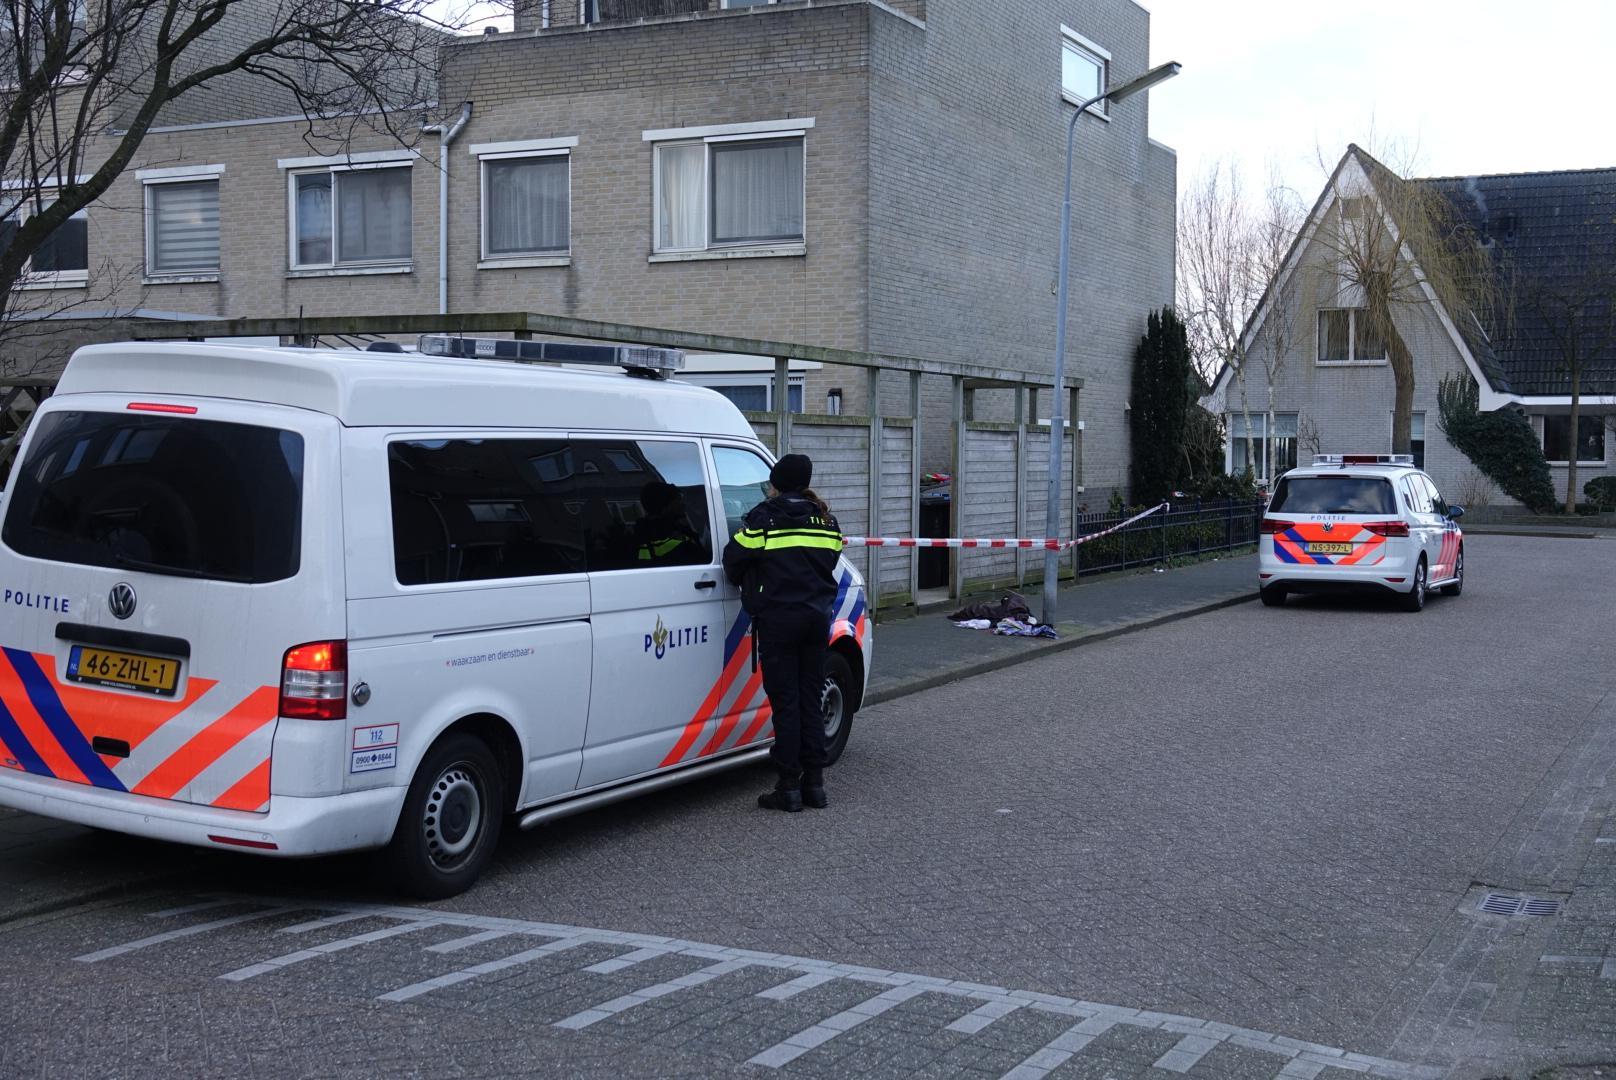 Steekpartij in woning aan de H. Soeteboomstraat in Zaandam